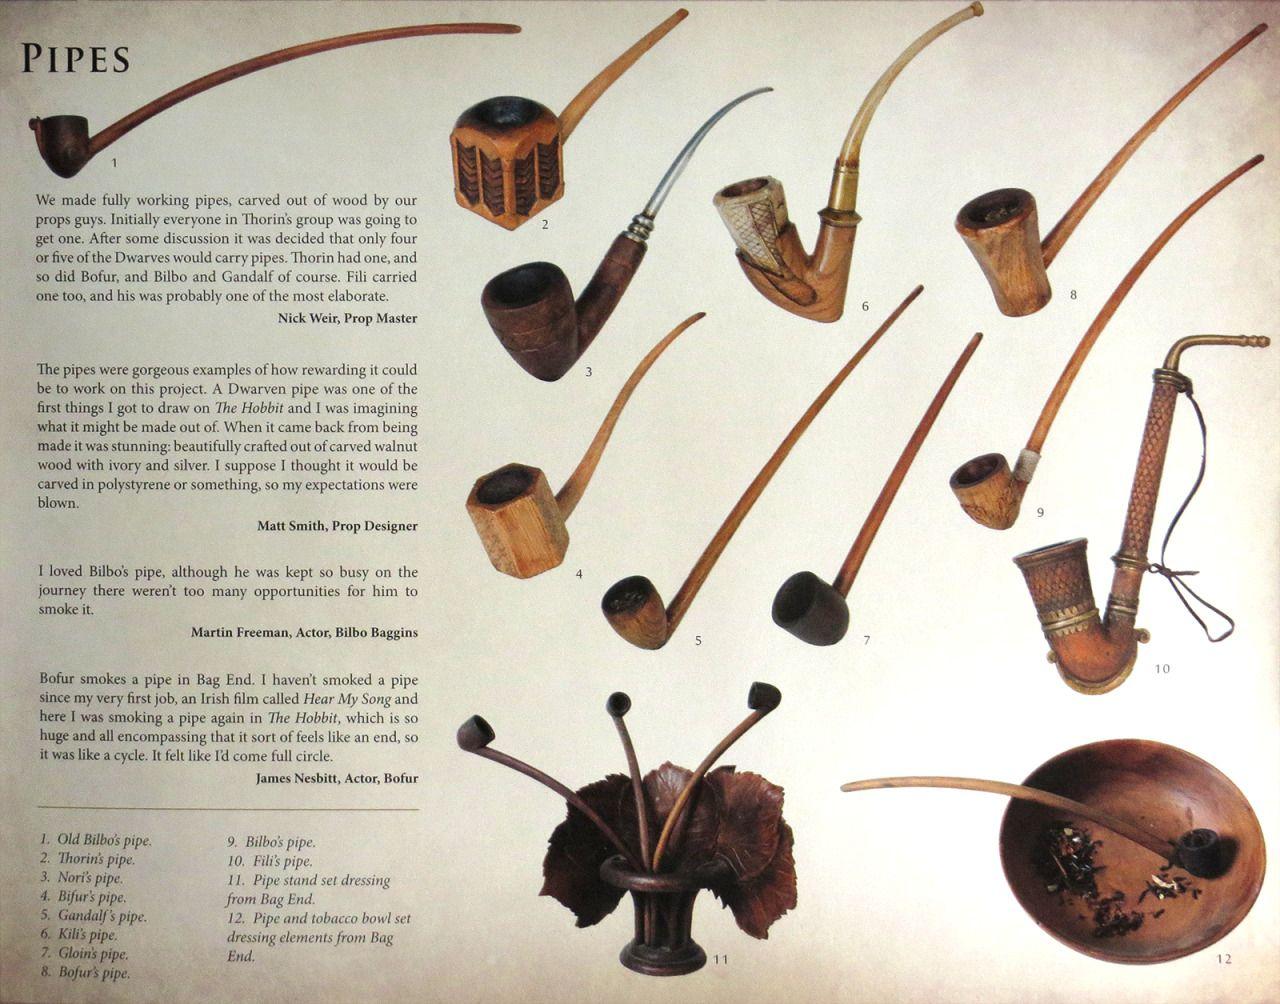 Gandalf et ses pipes - Page 2 50e3c8b308a3230baf3fcf6bb81dbb92